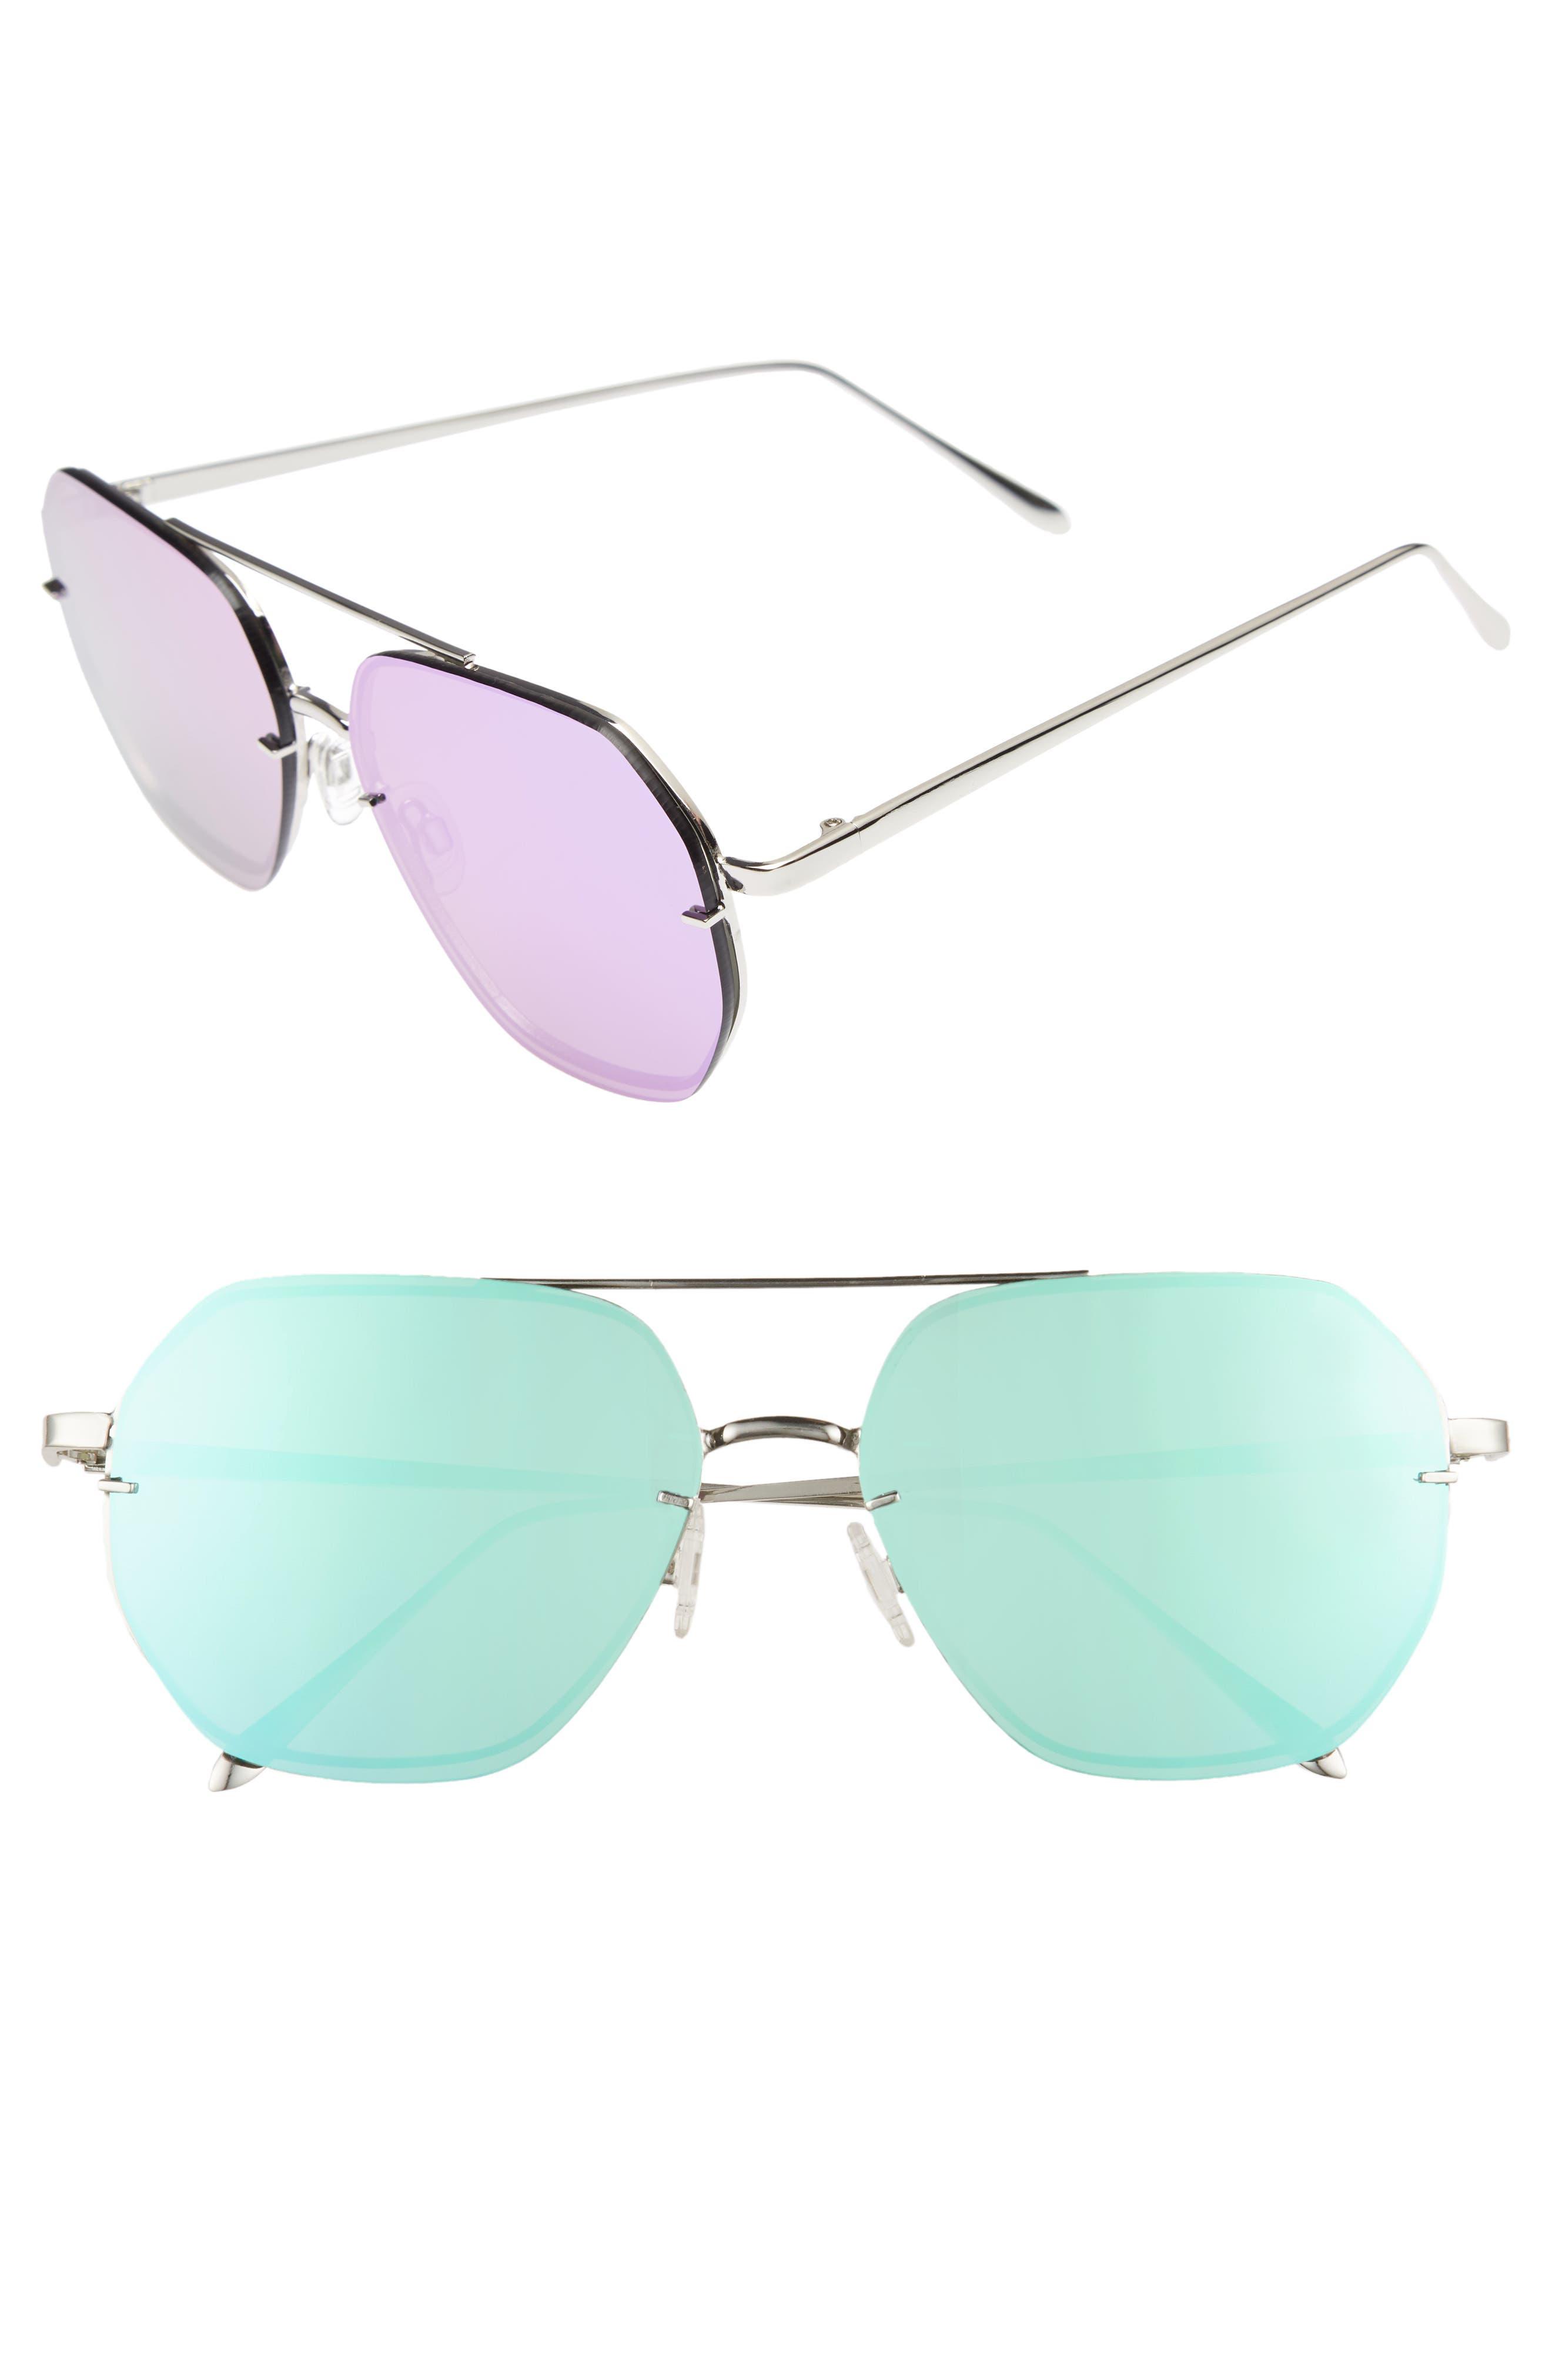 62mm Metal Flat Geo Aviator Sunglasses,                             Main thumbnail 1, color,                             SILVER/ PURPLE